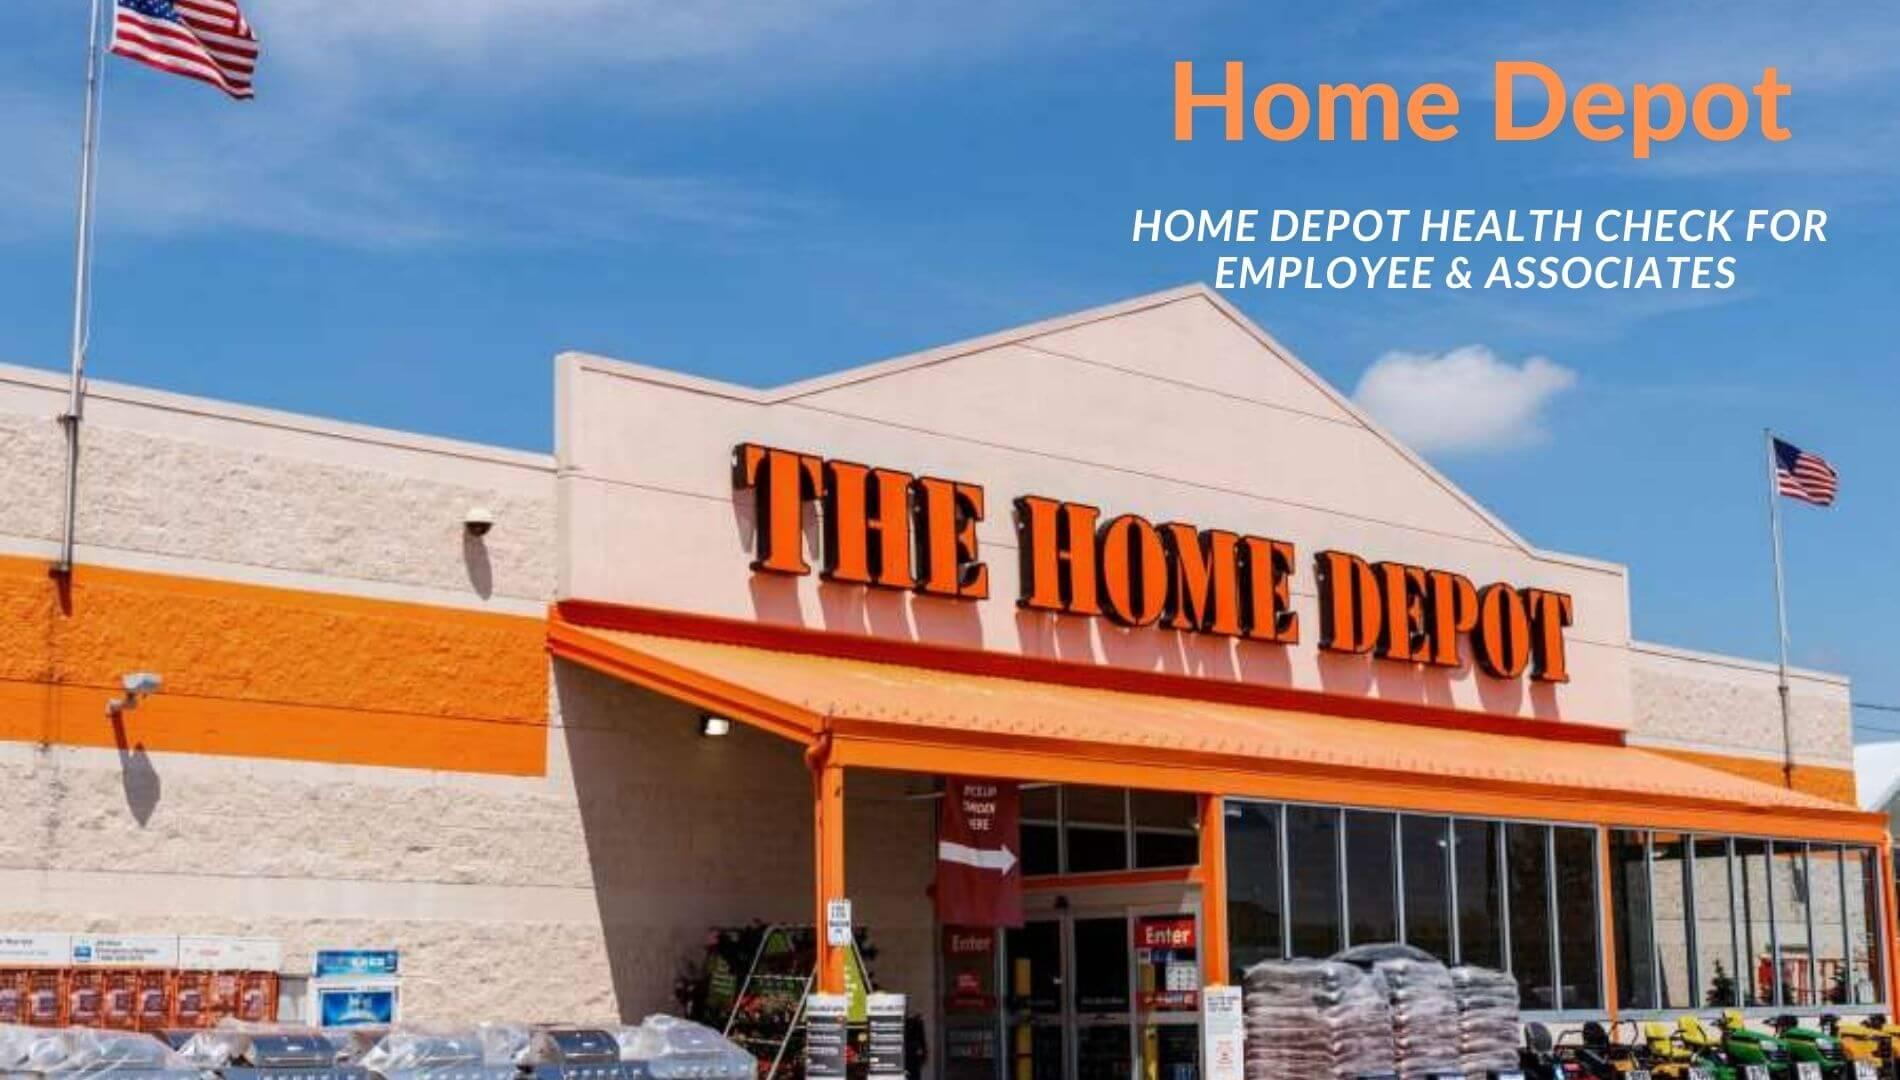 Home Depot Health Check for Employee & Associates